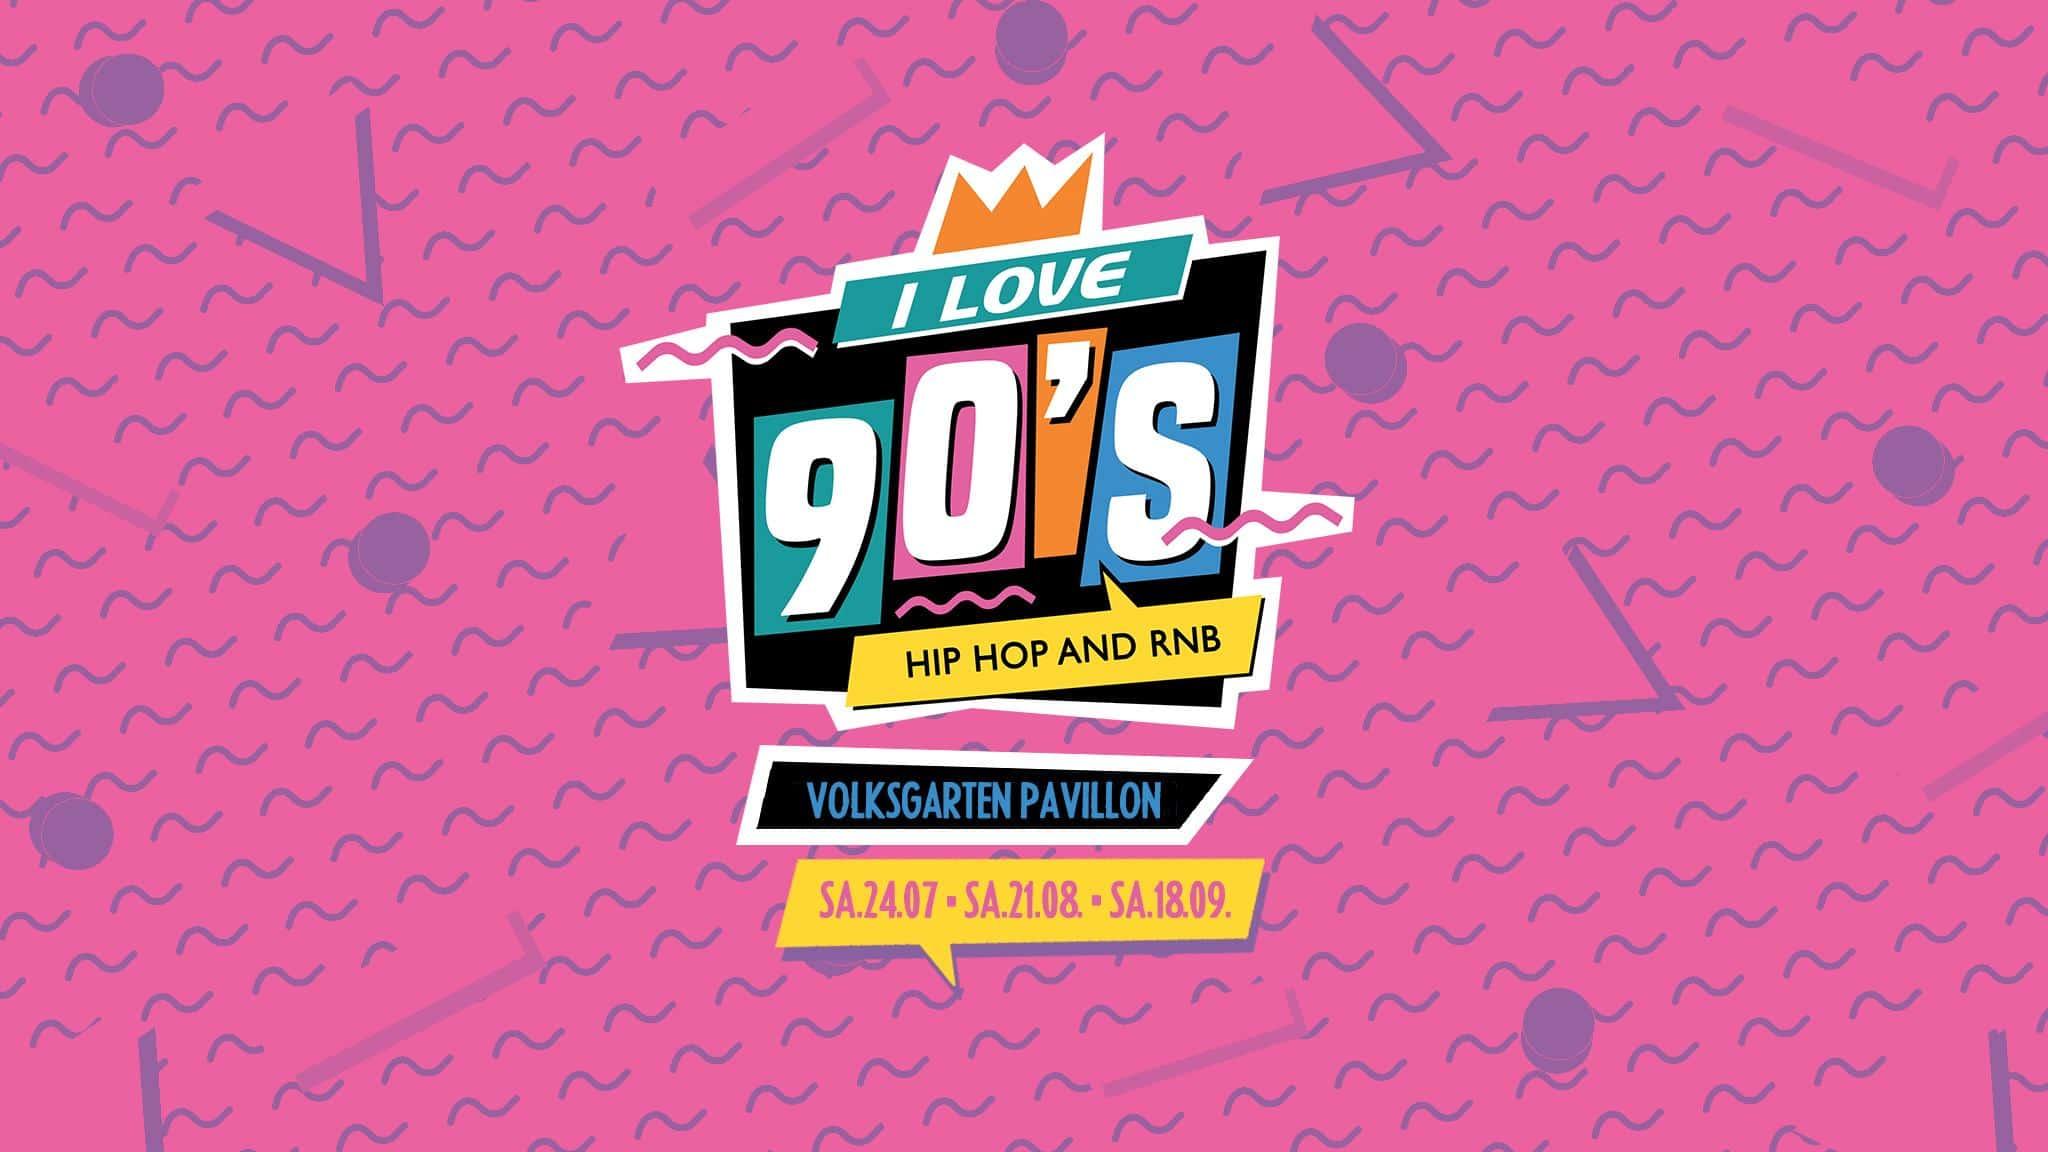 Events Wien: I Love 90's Hip Hop & RnB @ Volksgarten Pavillon 2021